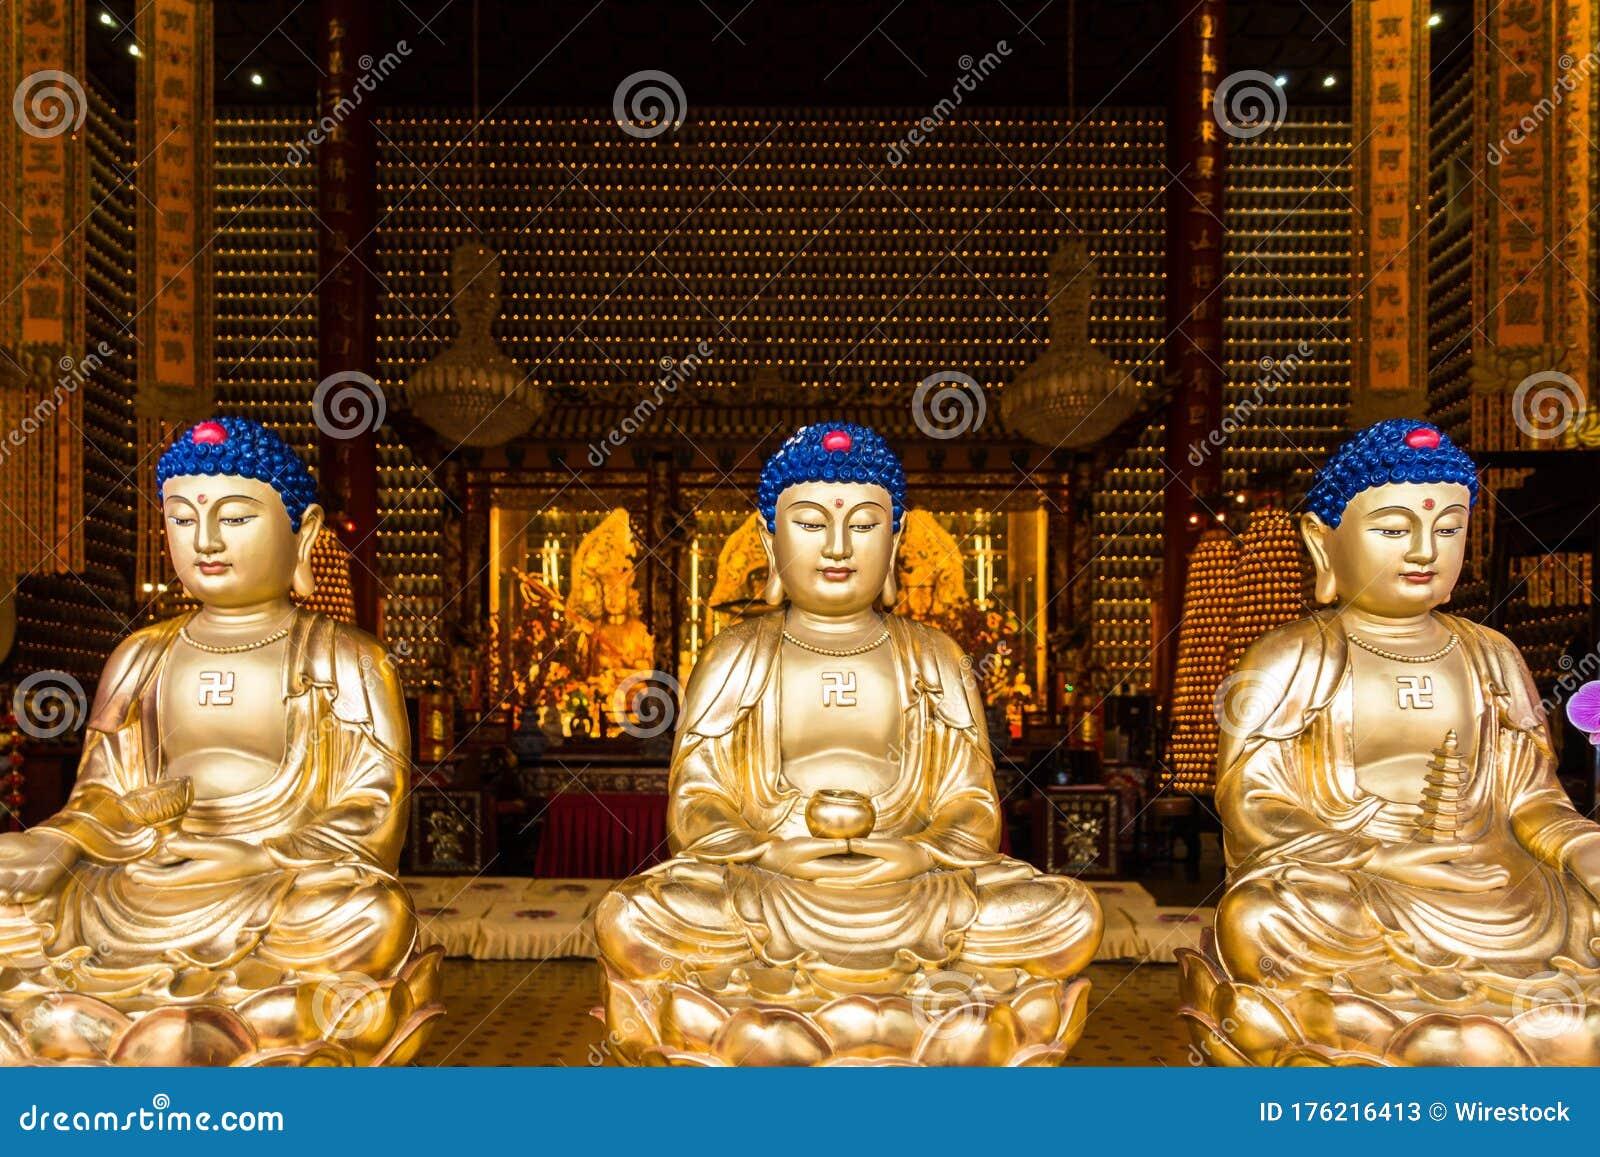 Row Of Three Golden Buddha Statues In The Ten Thousand Buddhas Monastery Hong Kong Sha Tin Stock Image Image Of Golden Asia 176216413